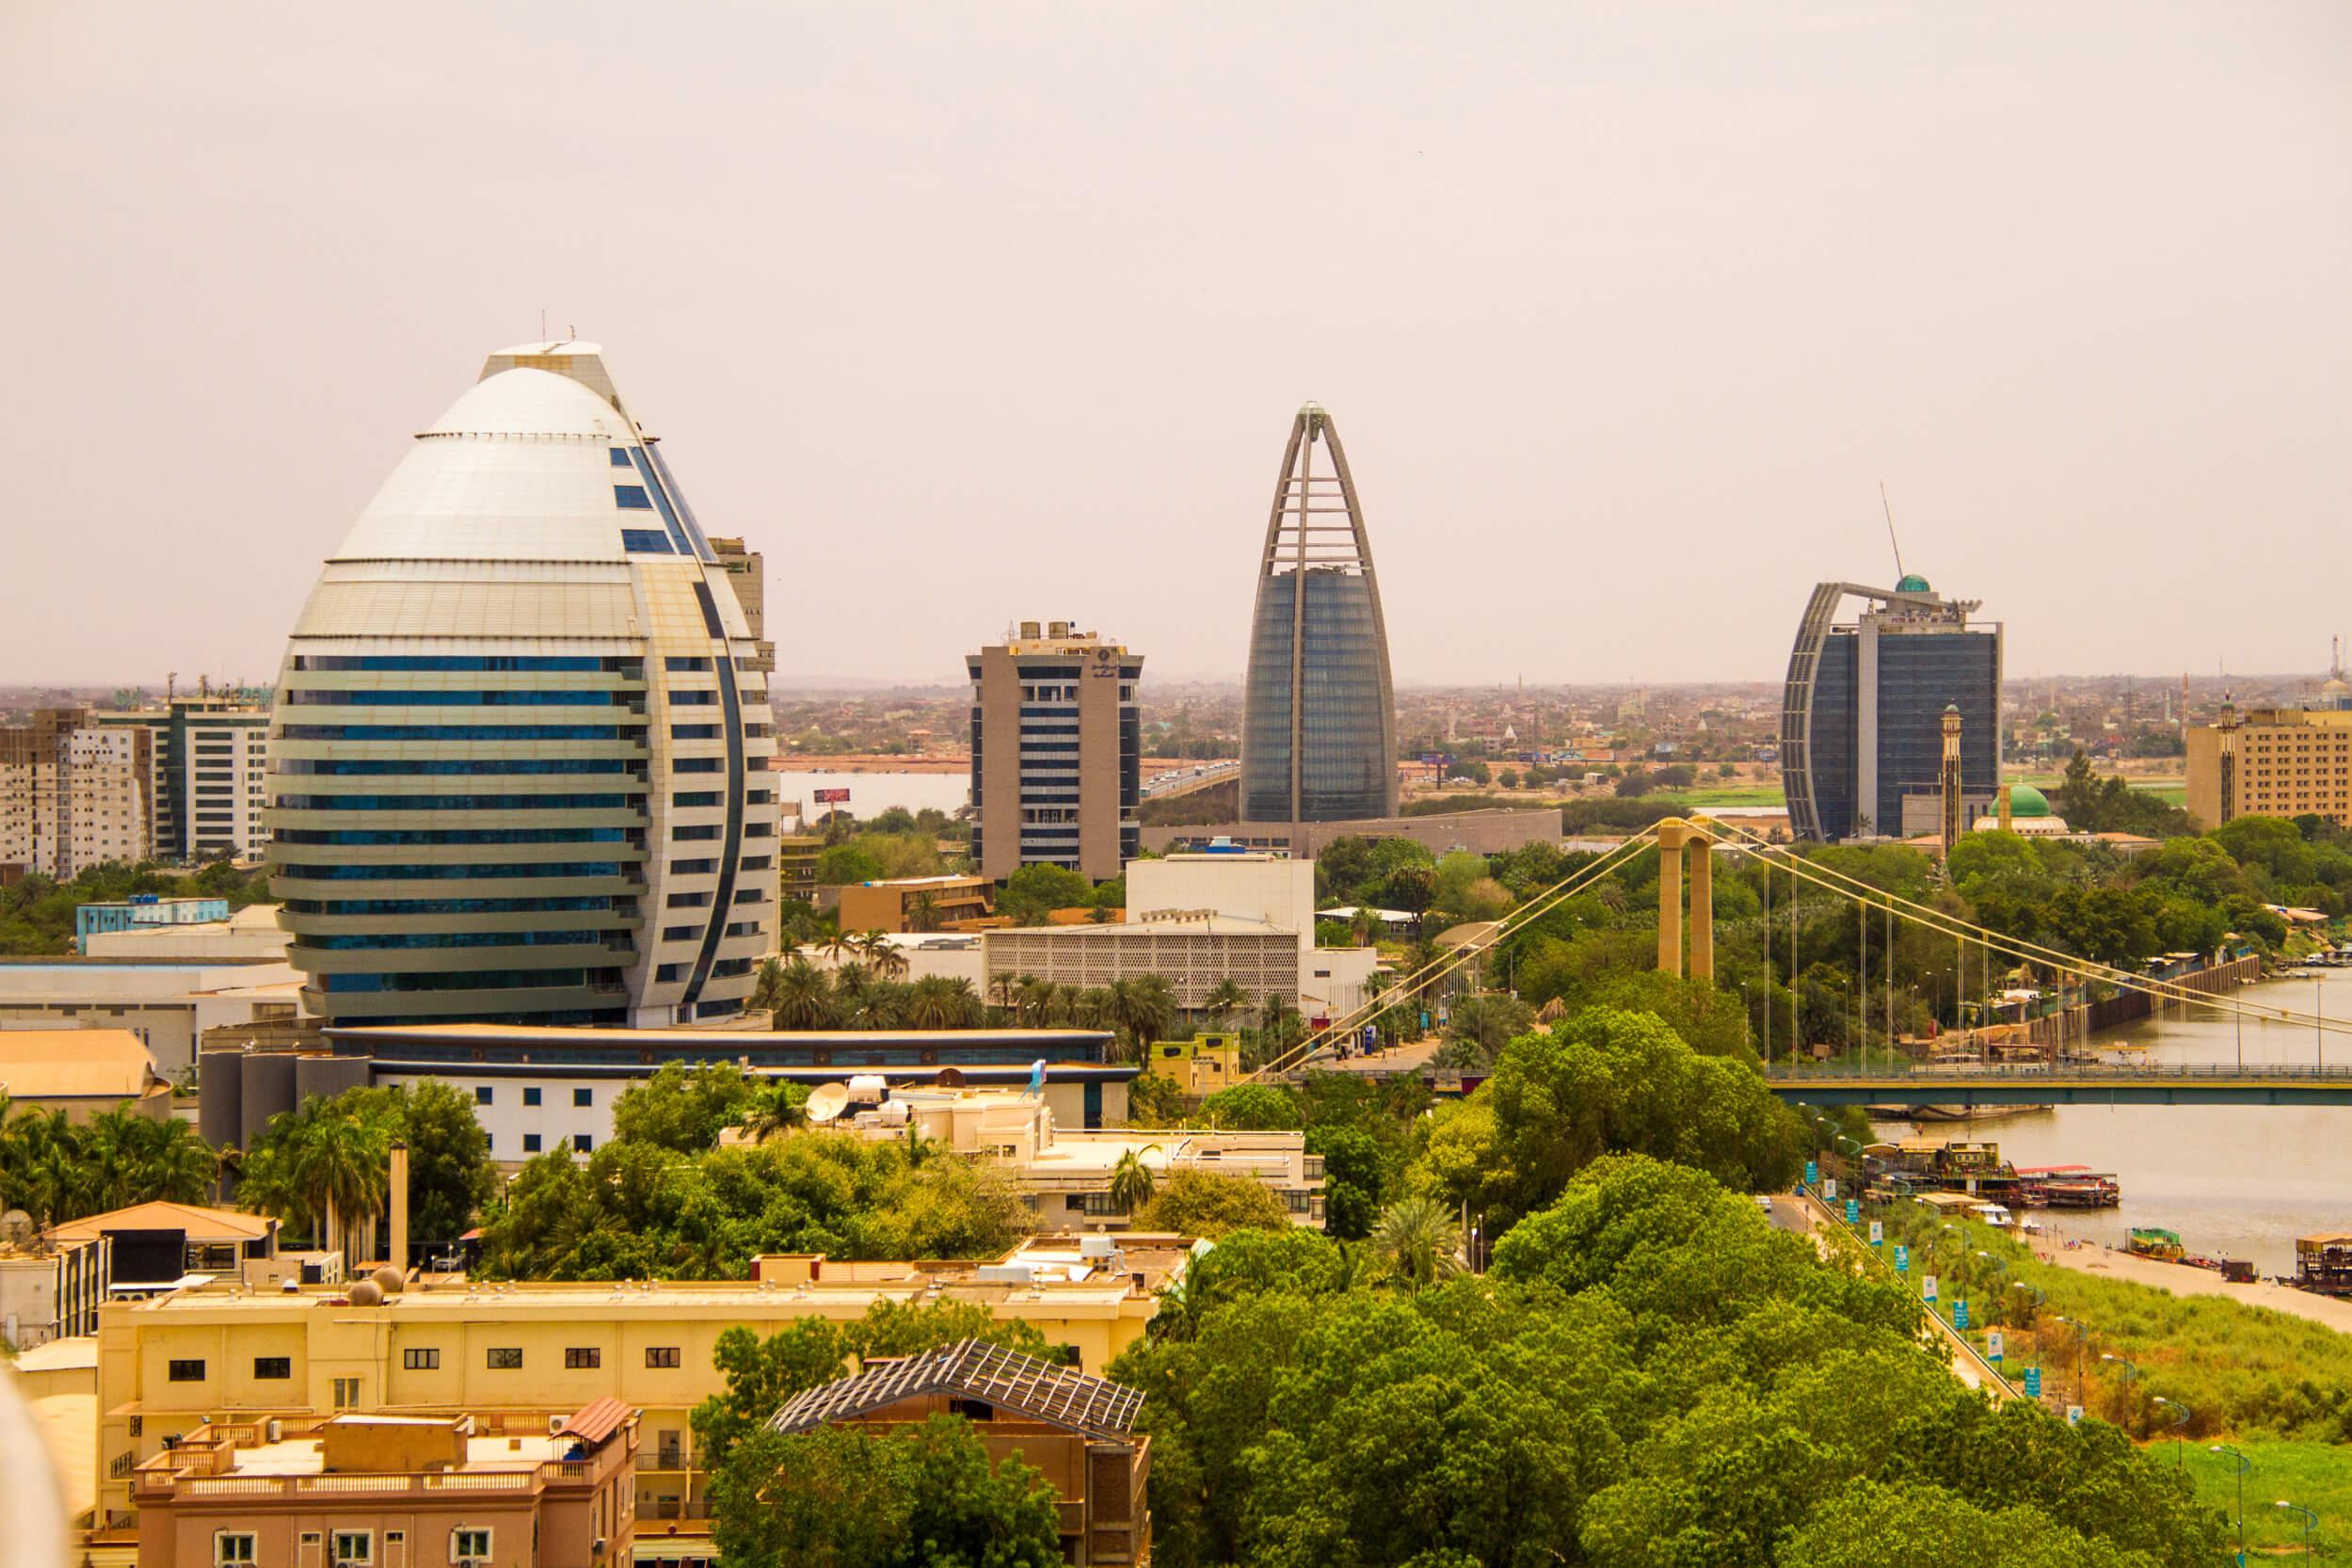 https://bubo.sk/uploads/galleries/7407/marekmeluch_sudan_khartoum_corinthia.jpg